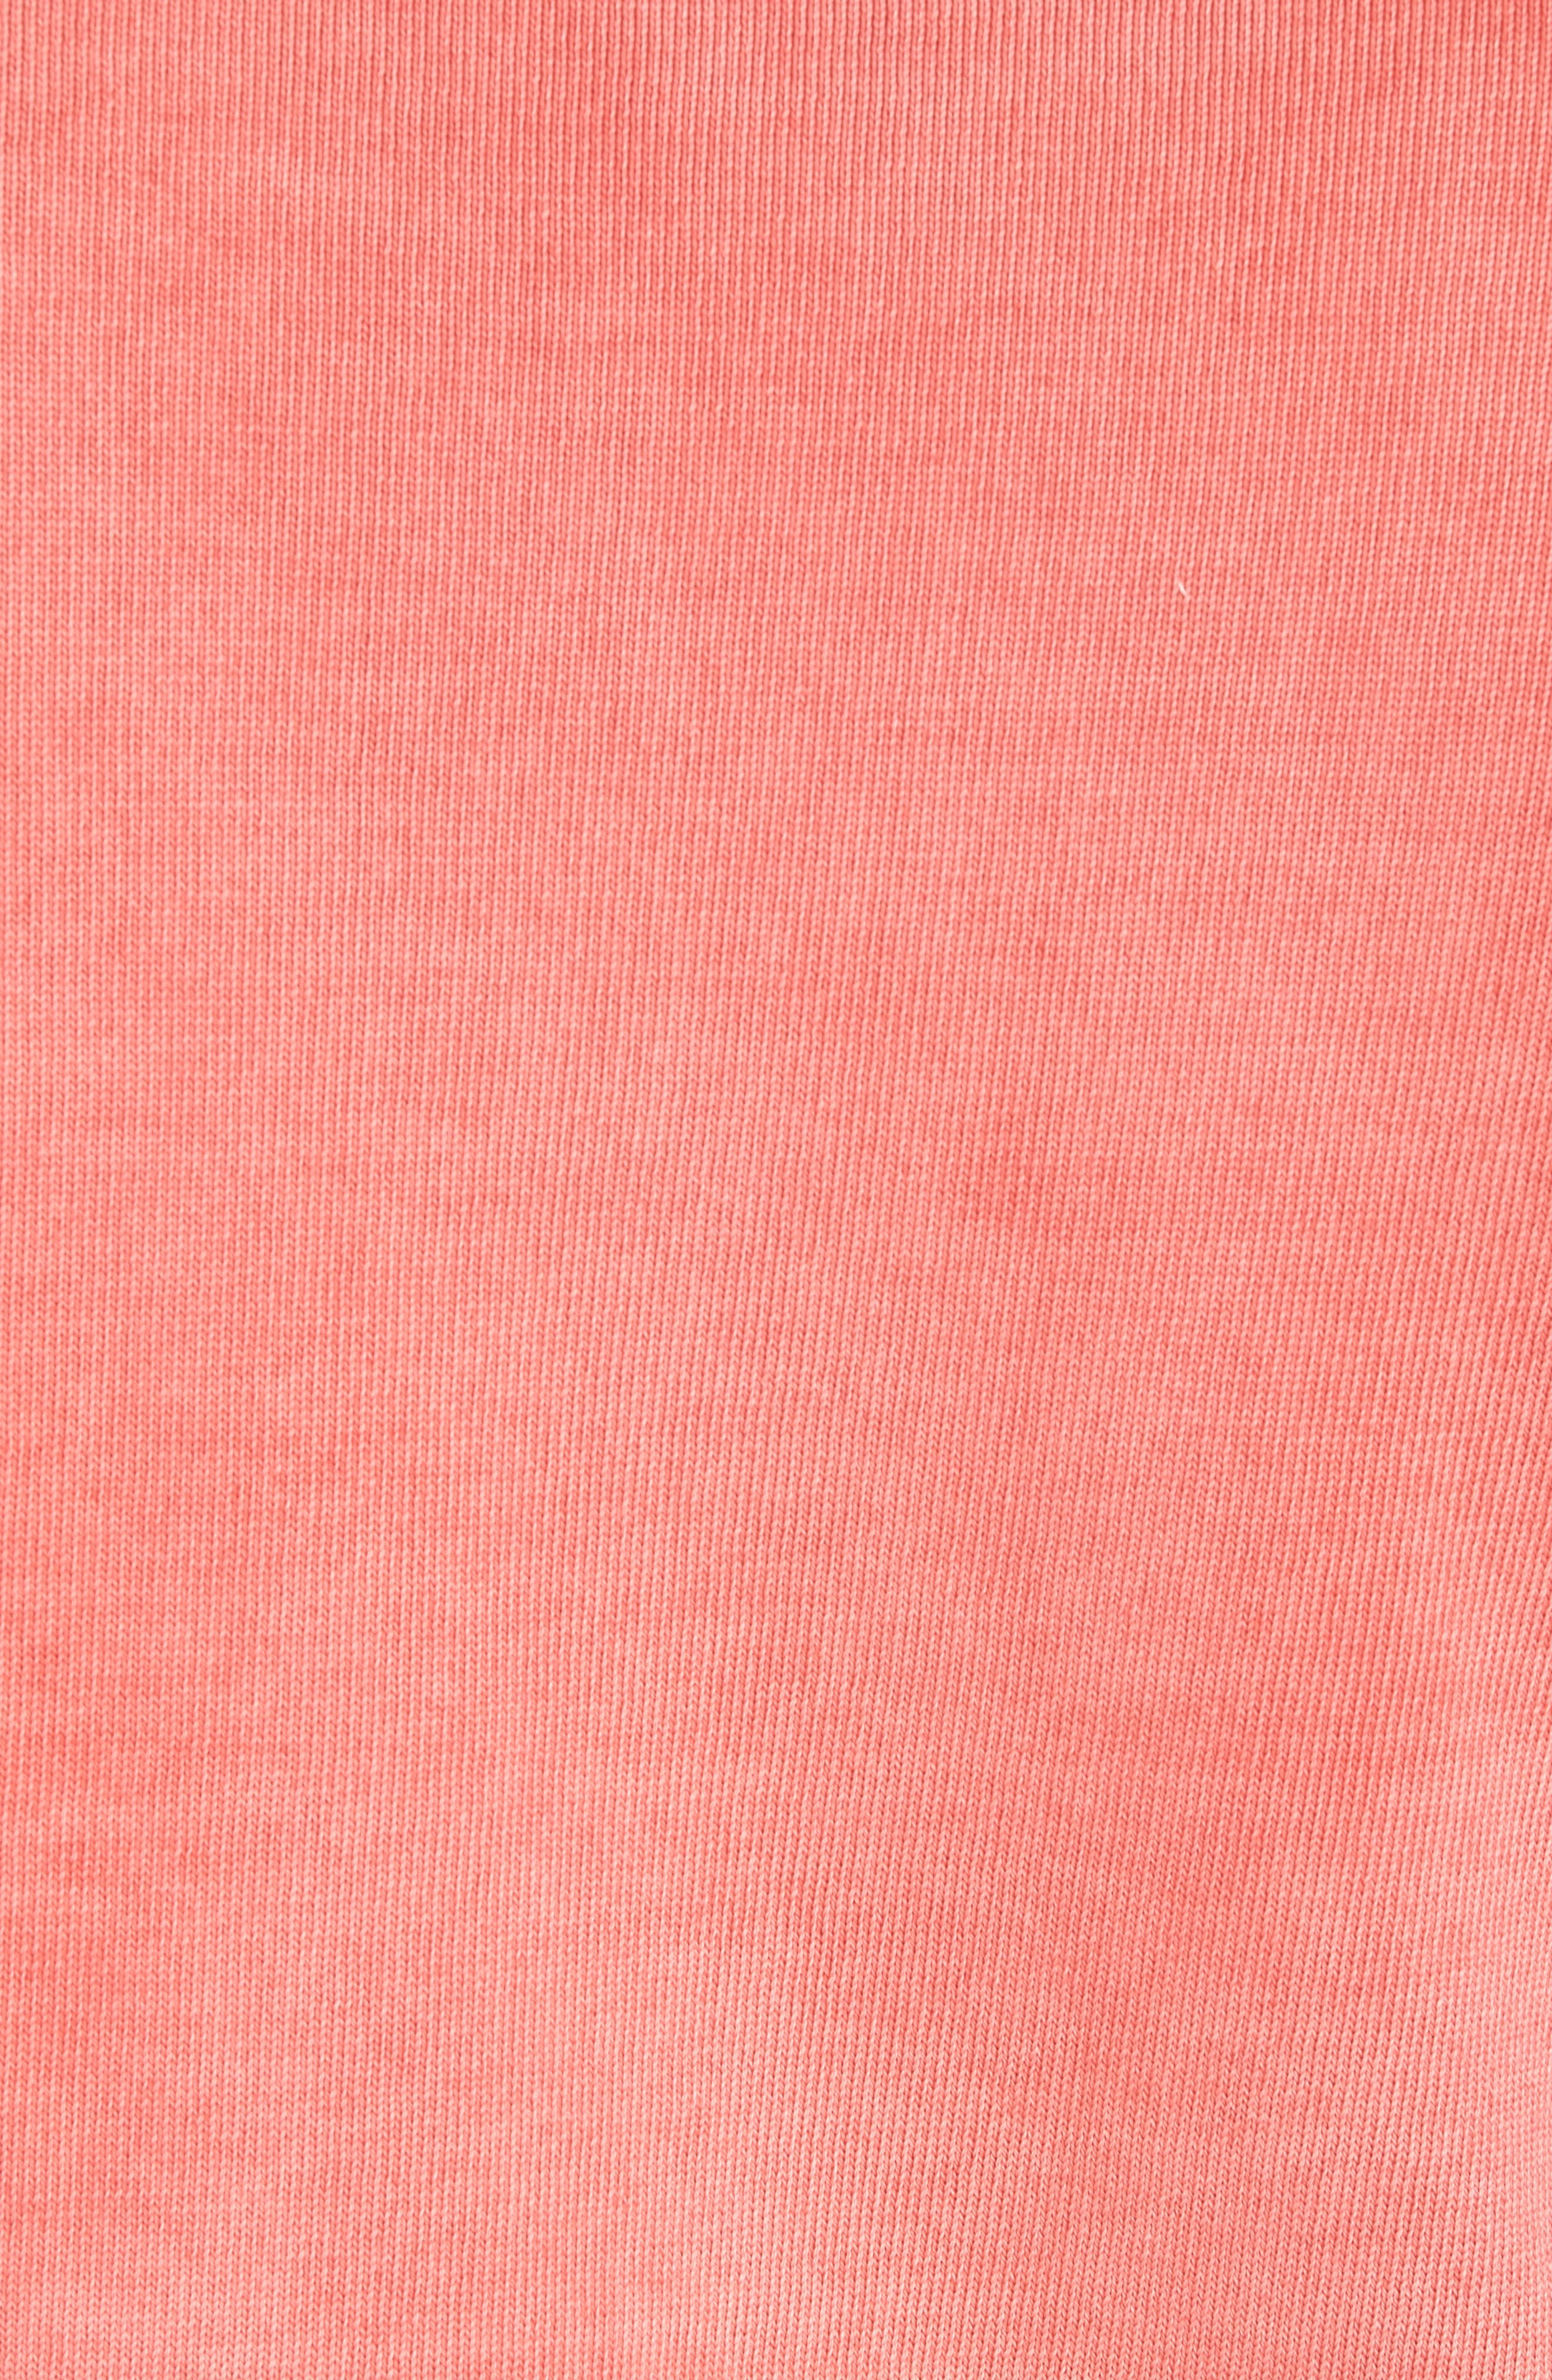 Stonewash Cotton Sweatshirt,                             Alternate thumbnail 5, color,                             842